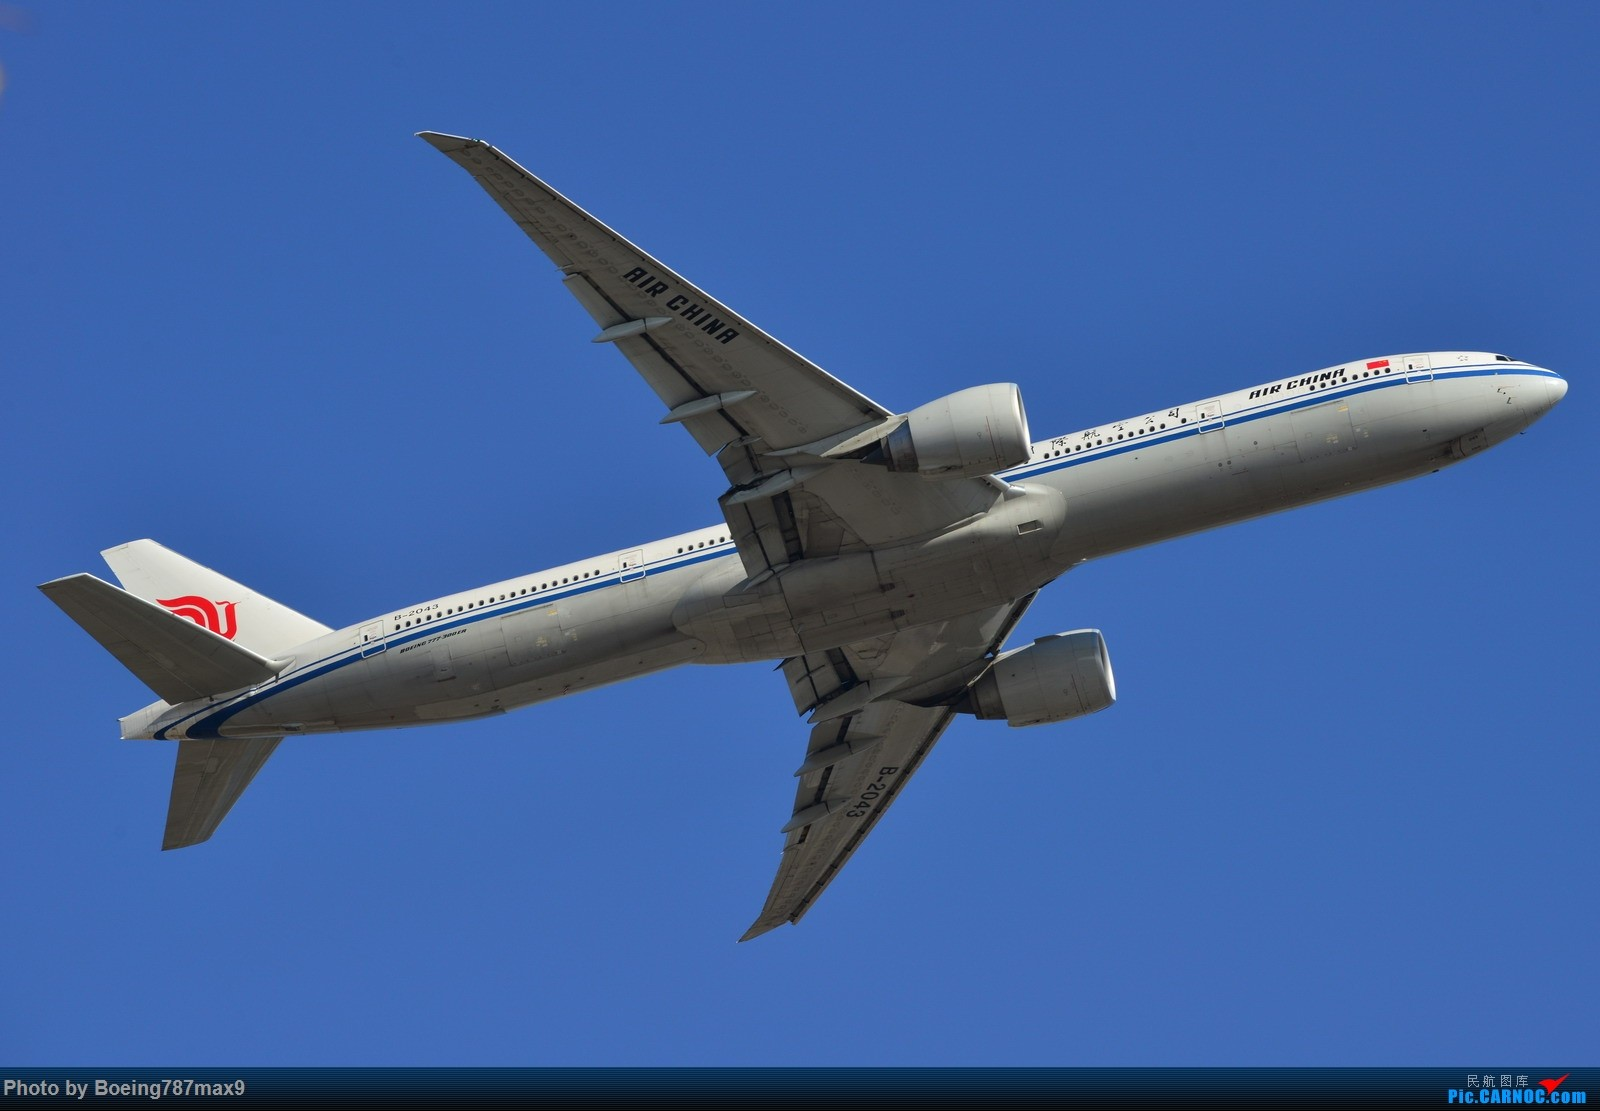 Re:[原创]【PEK】今日东停车场蹲点,好货一堆。KLM744、DELTA763、国航星空332、国航748、最重要的是朝鲜的图204、还有国航中法50年77W、汉莎346 BOEING 777-300ER B-2043 中国北京首都国际机场